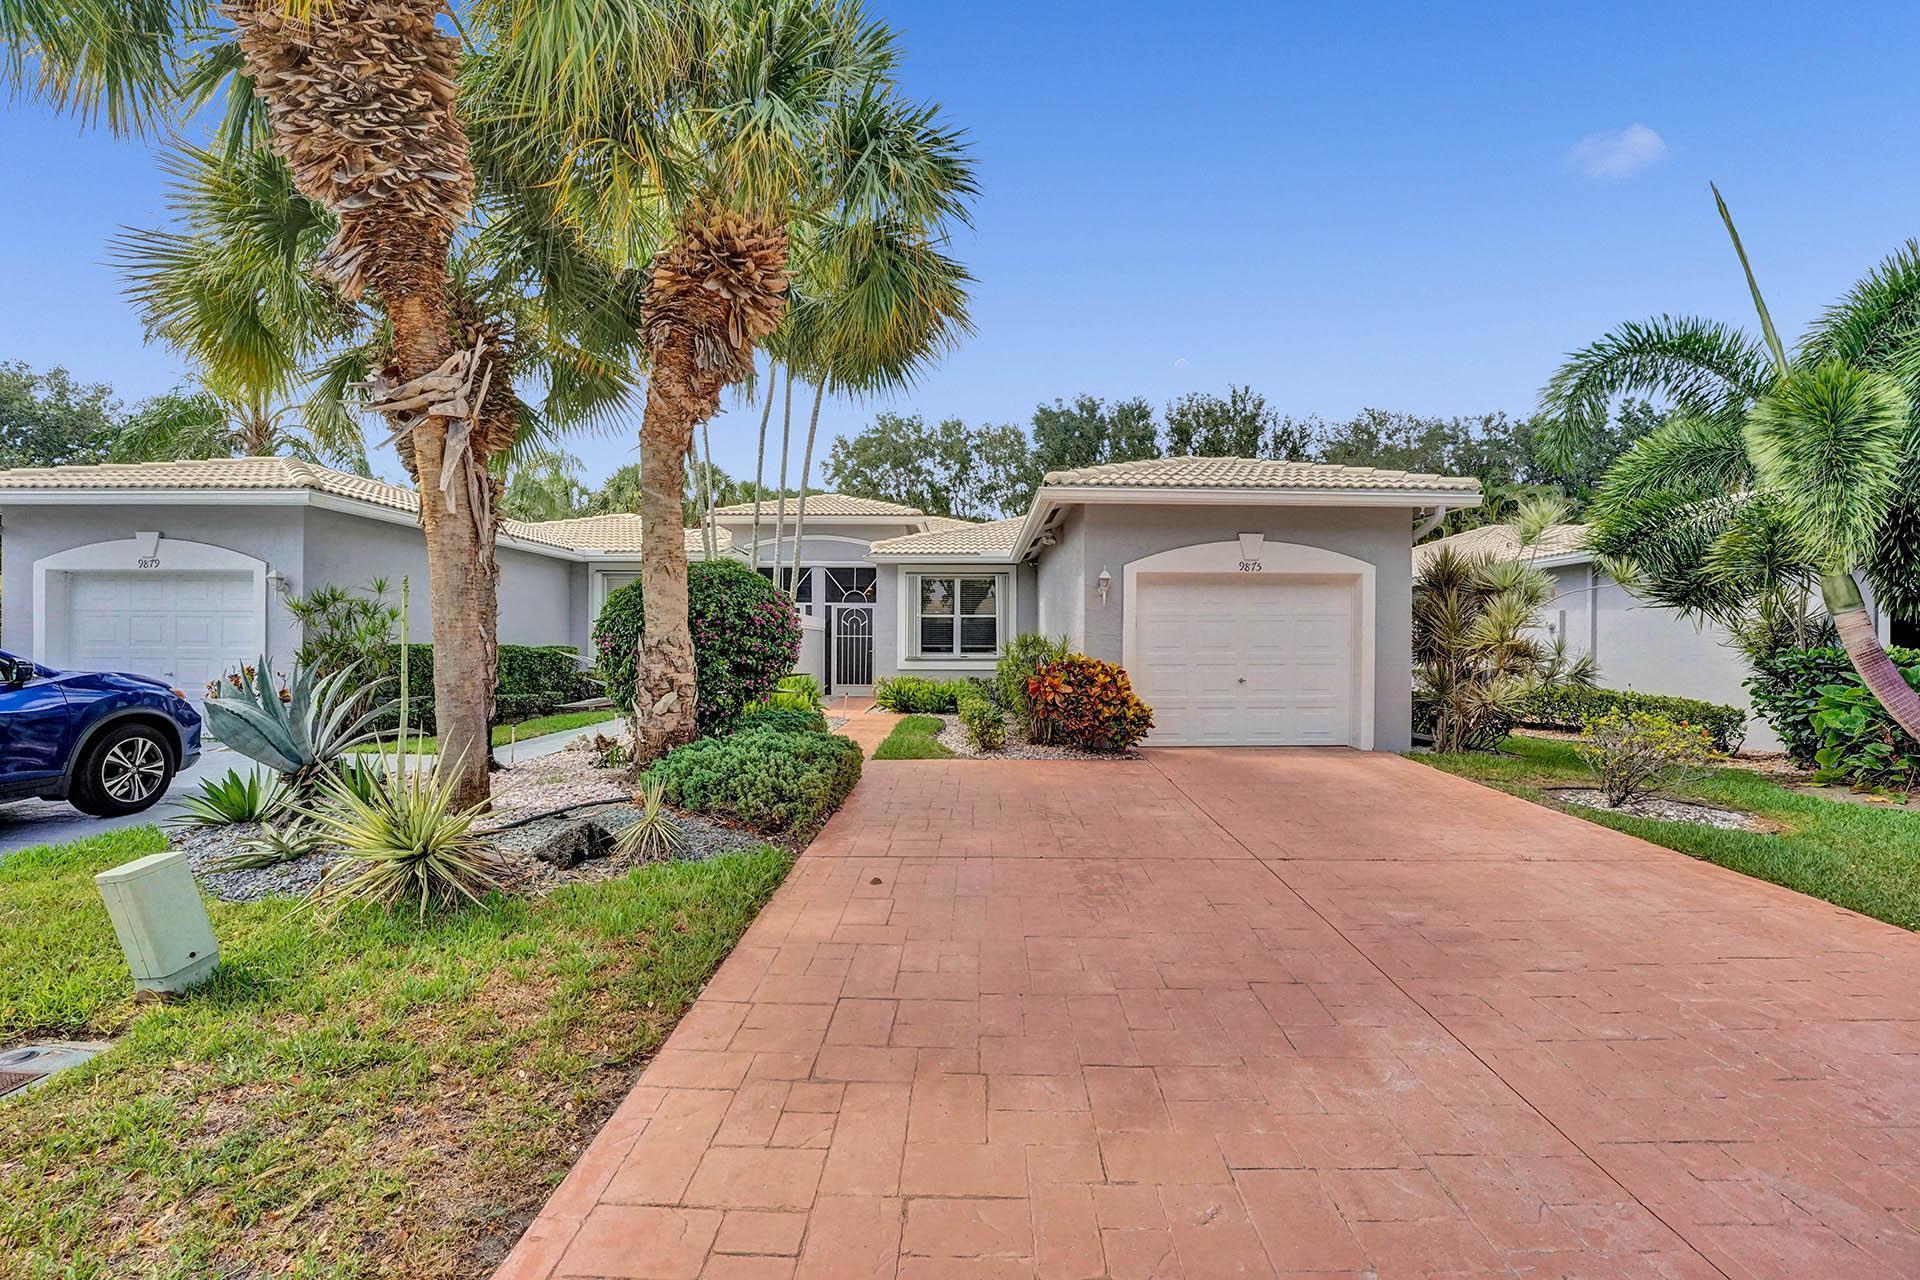 9875 Crescent View Drive Boynton Beach, FL 33437